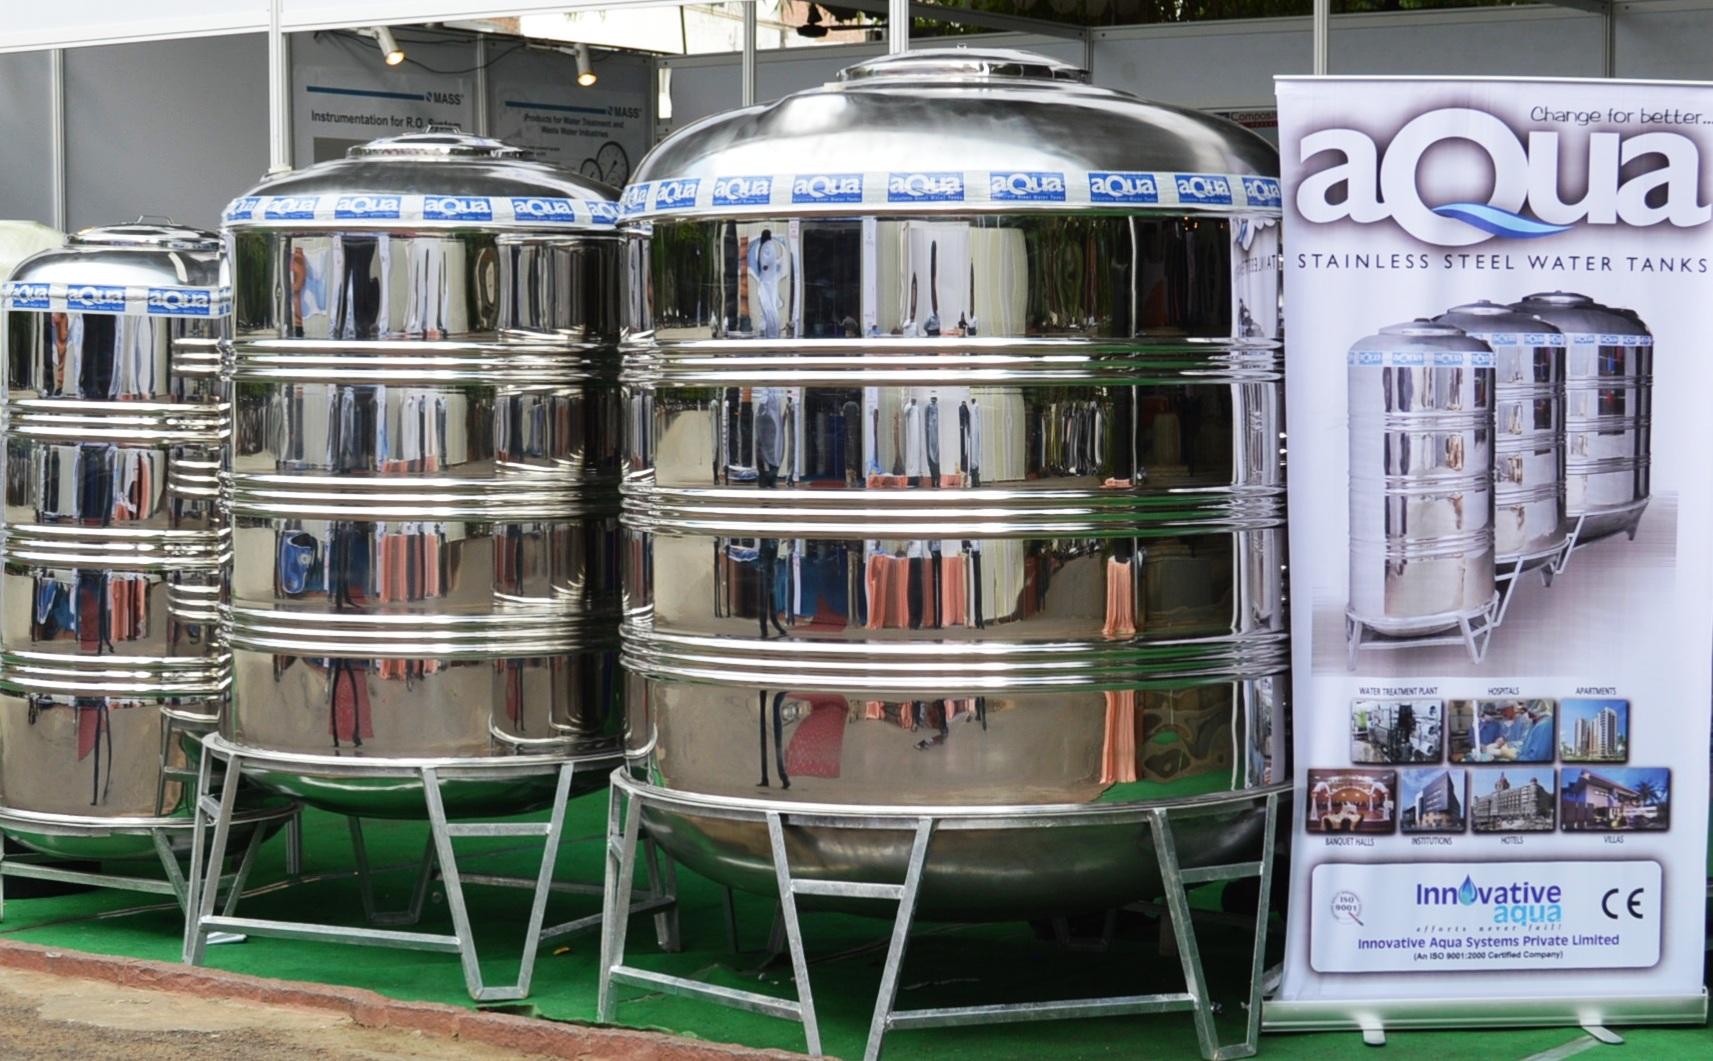 Innovative aqua systems Pvt ltd